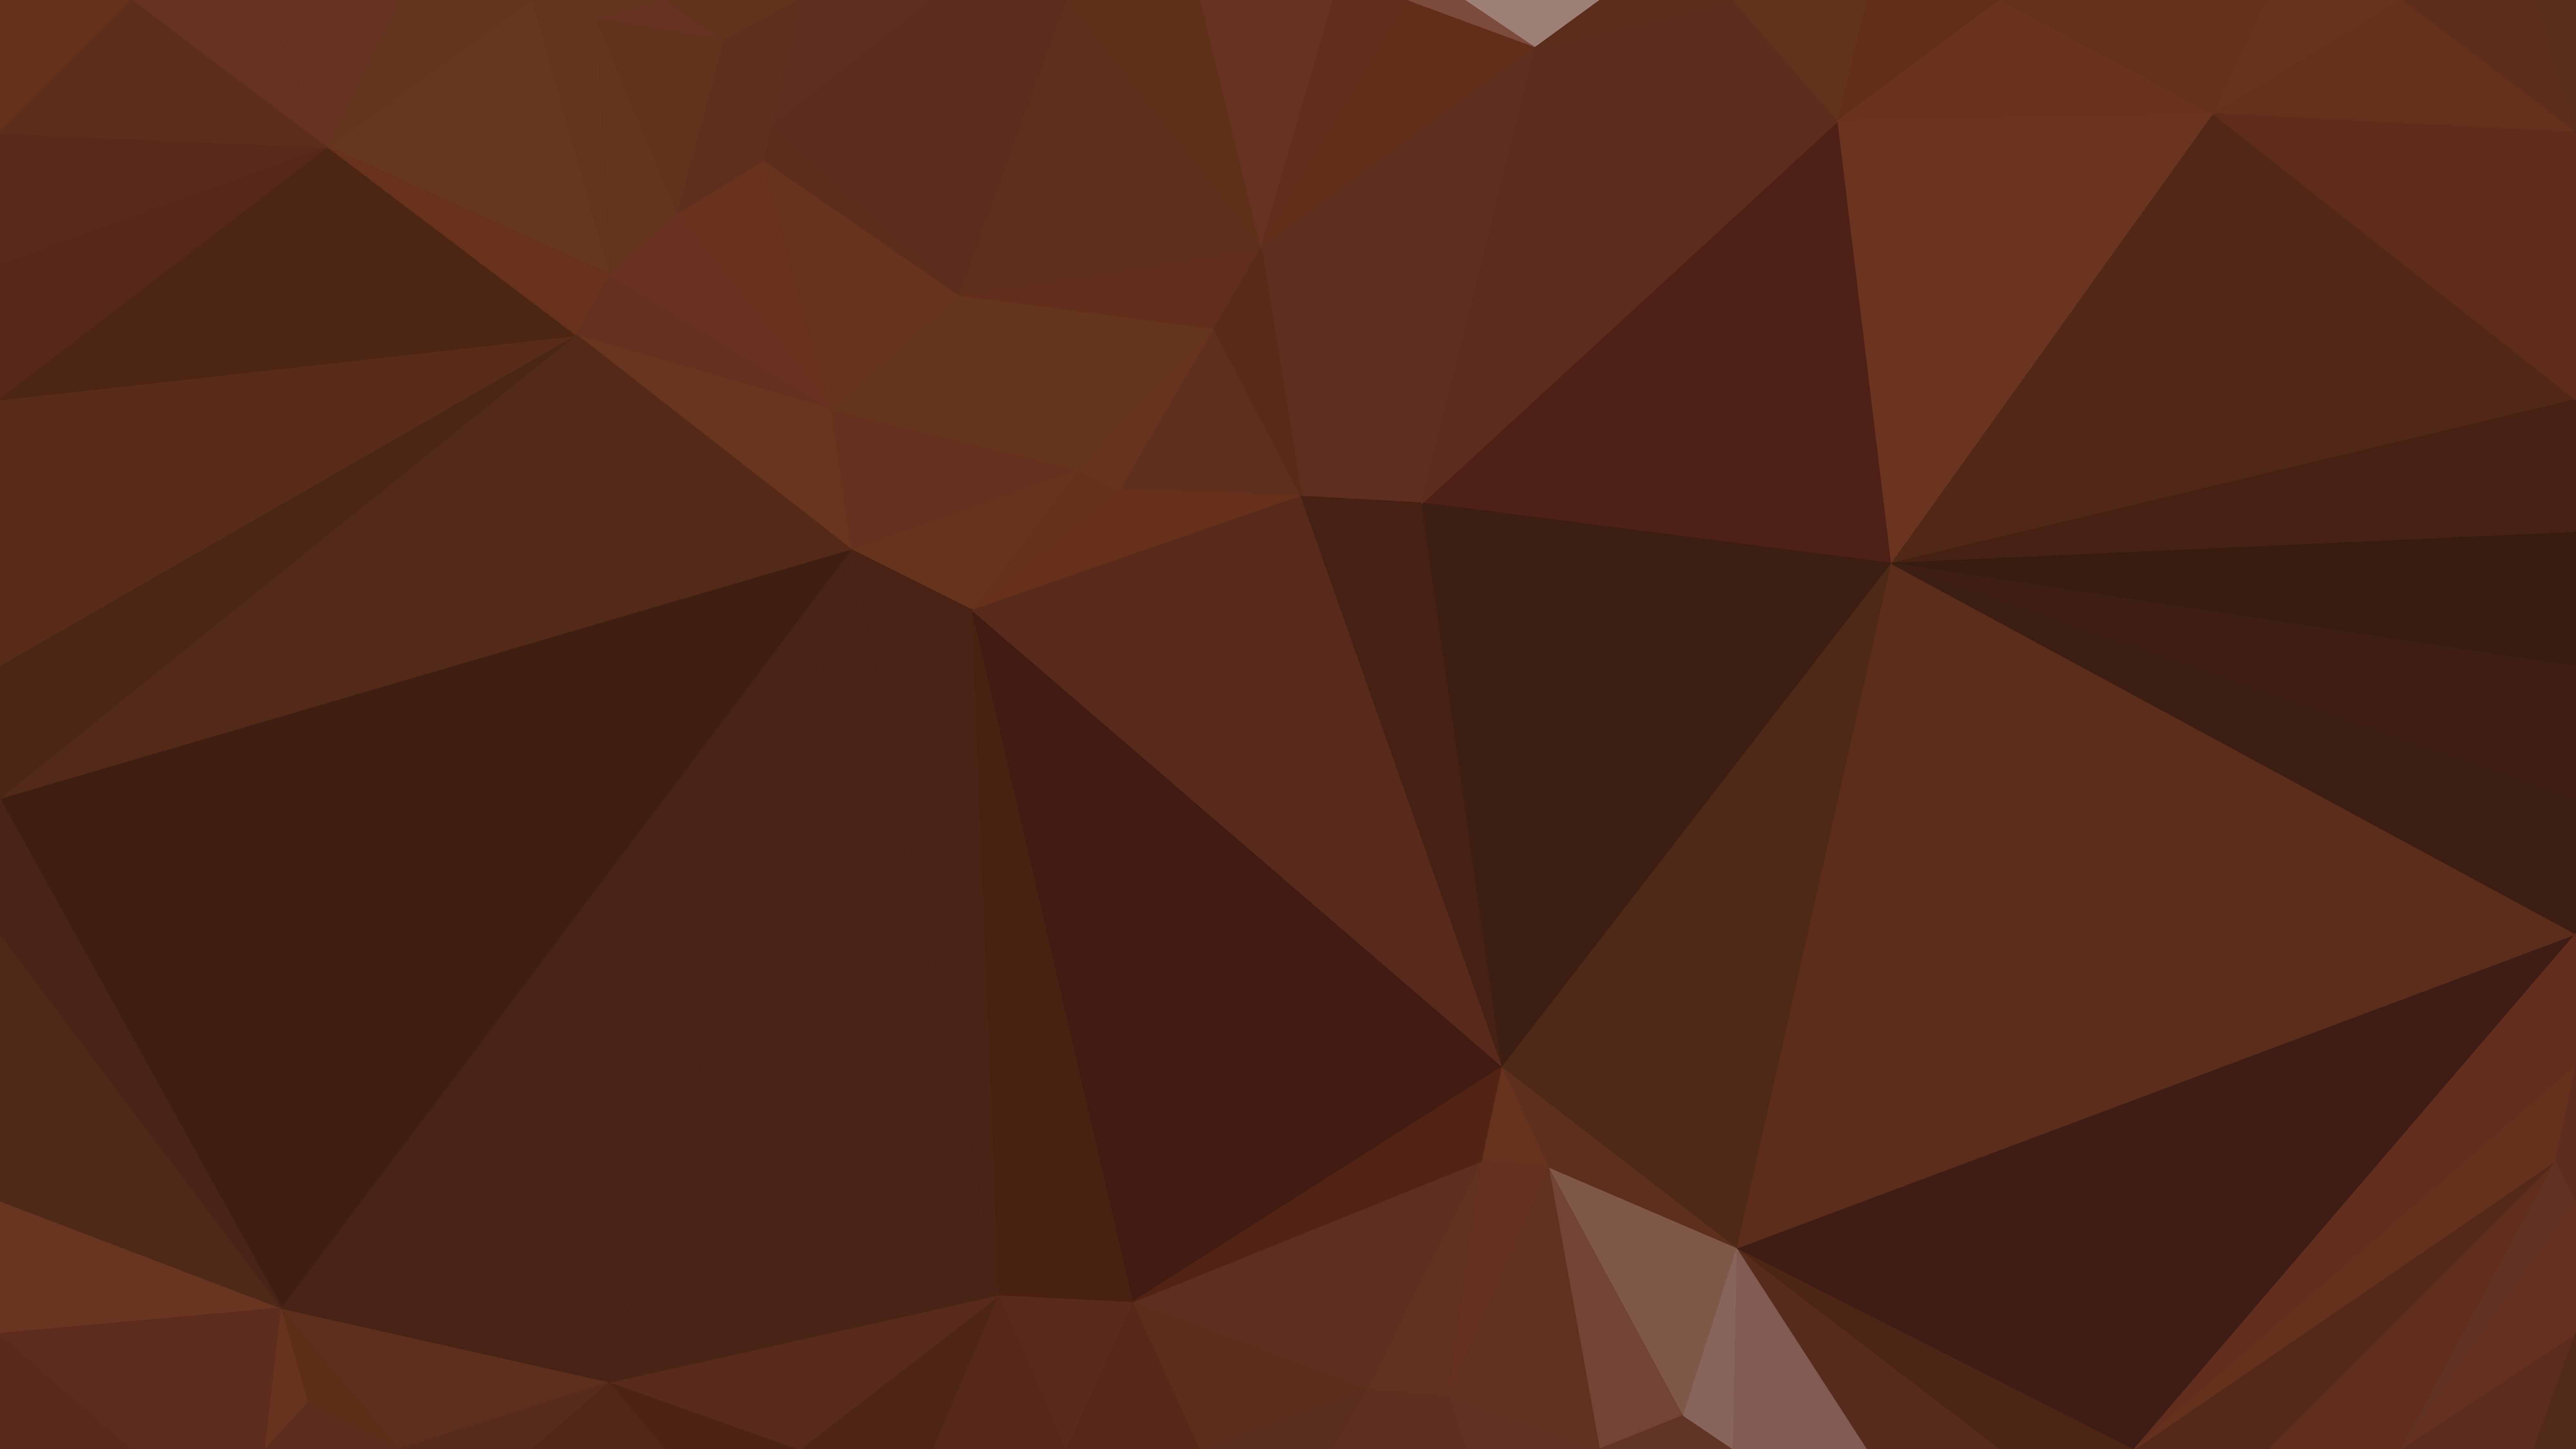 Coffee Brown Polygonal Background Design Image 8000x4500